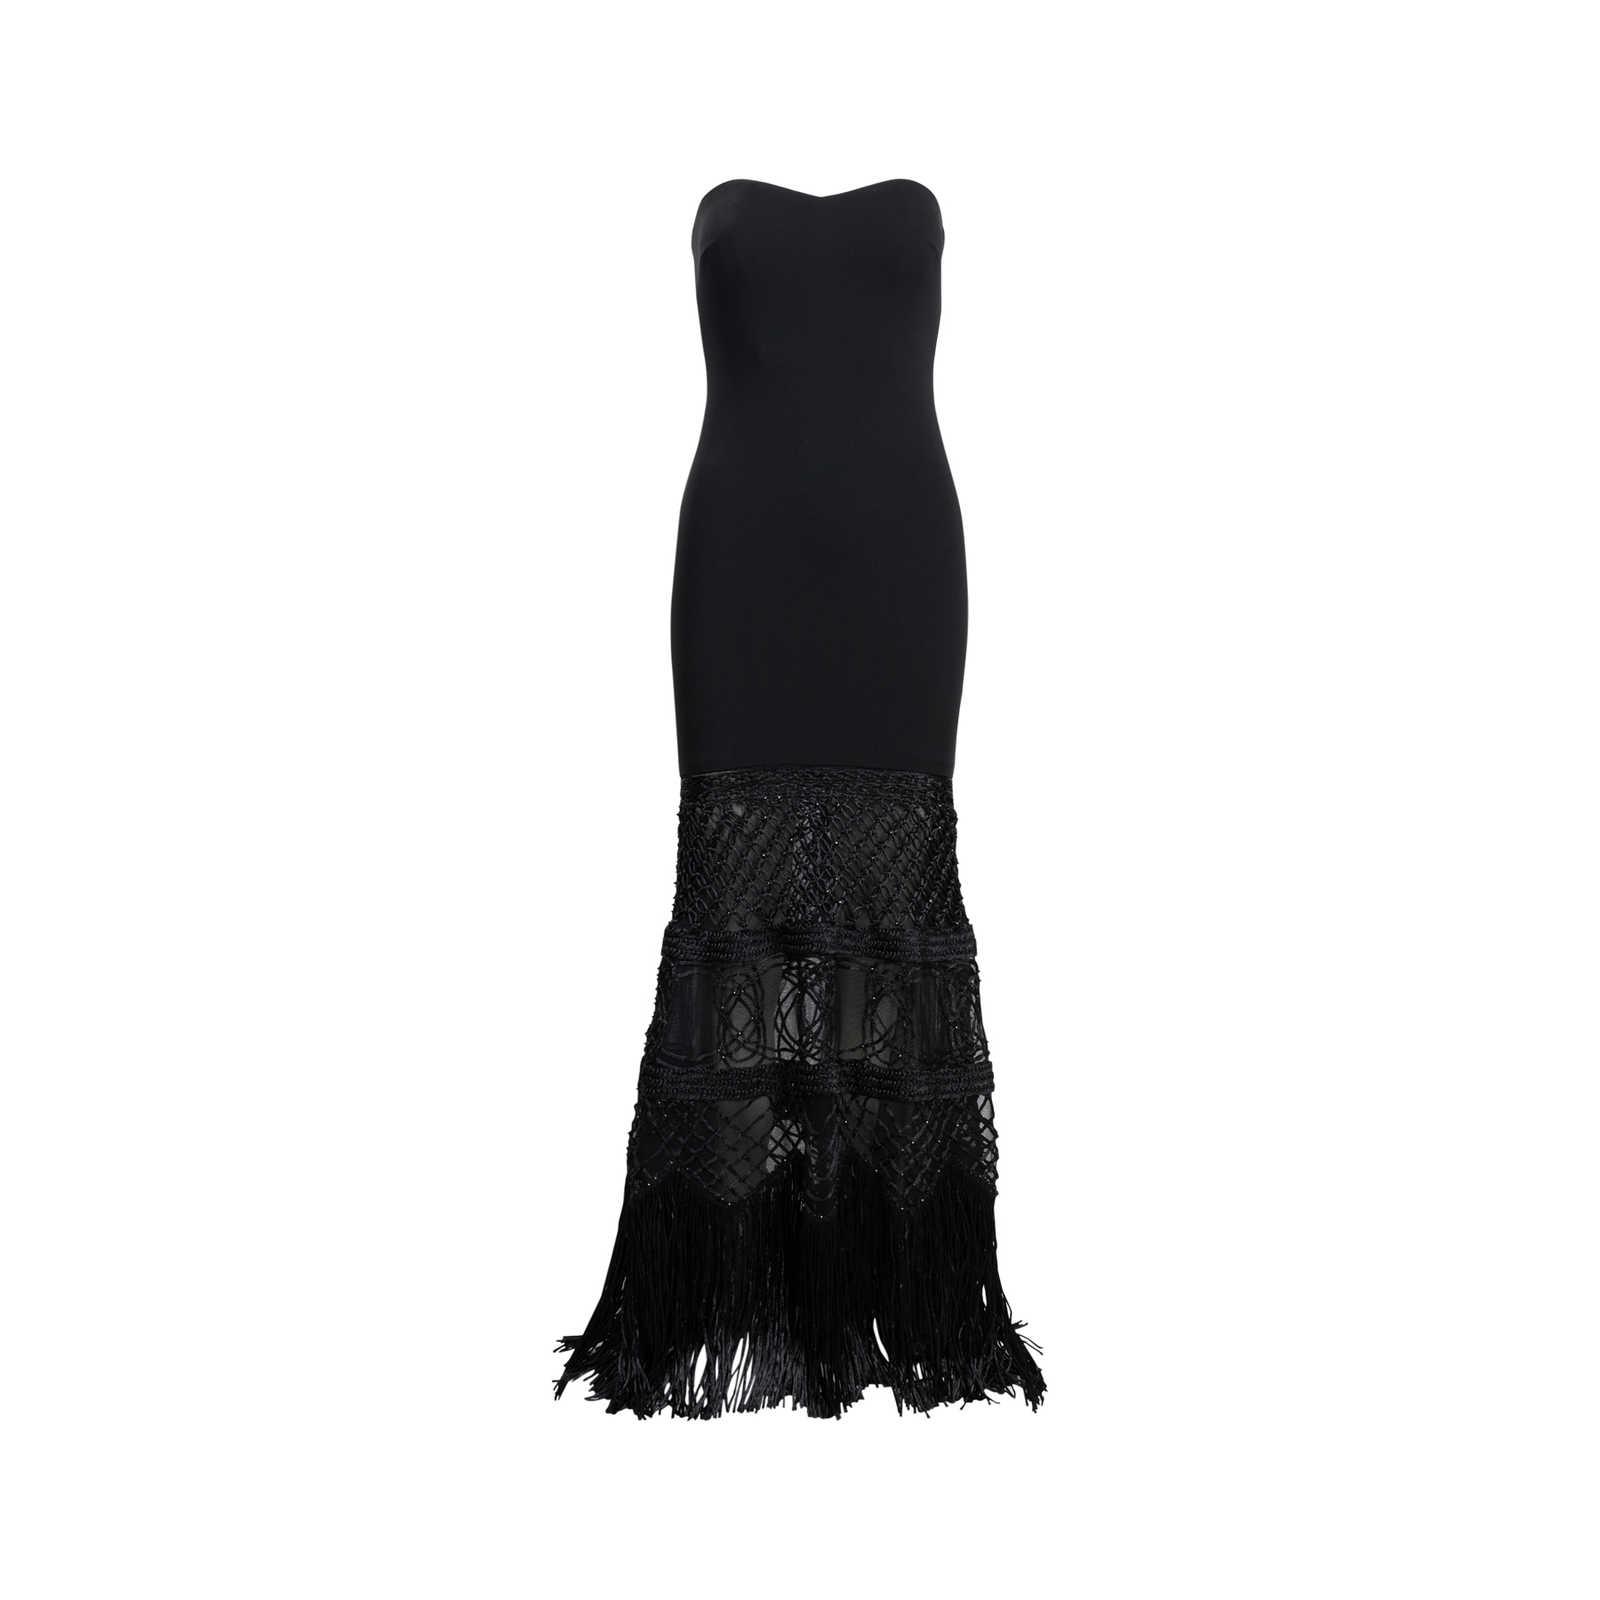 Authentic Second Hand Badgley Mischka Strapless Fringe Gown